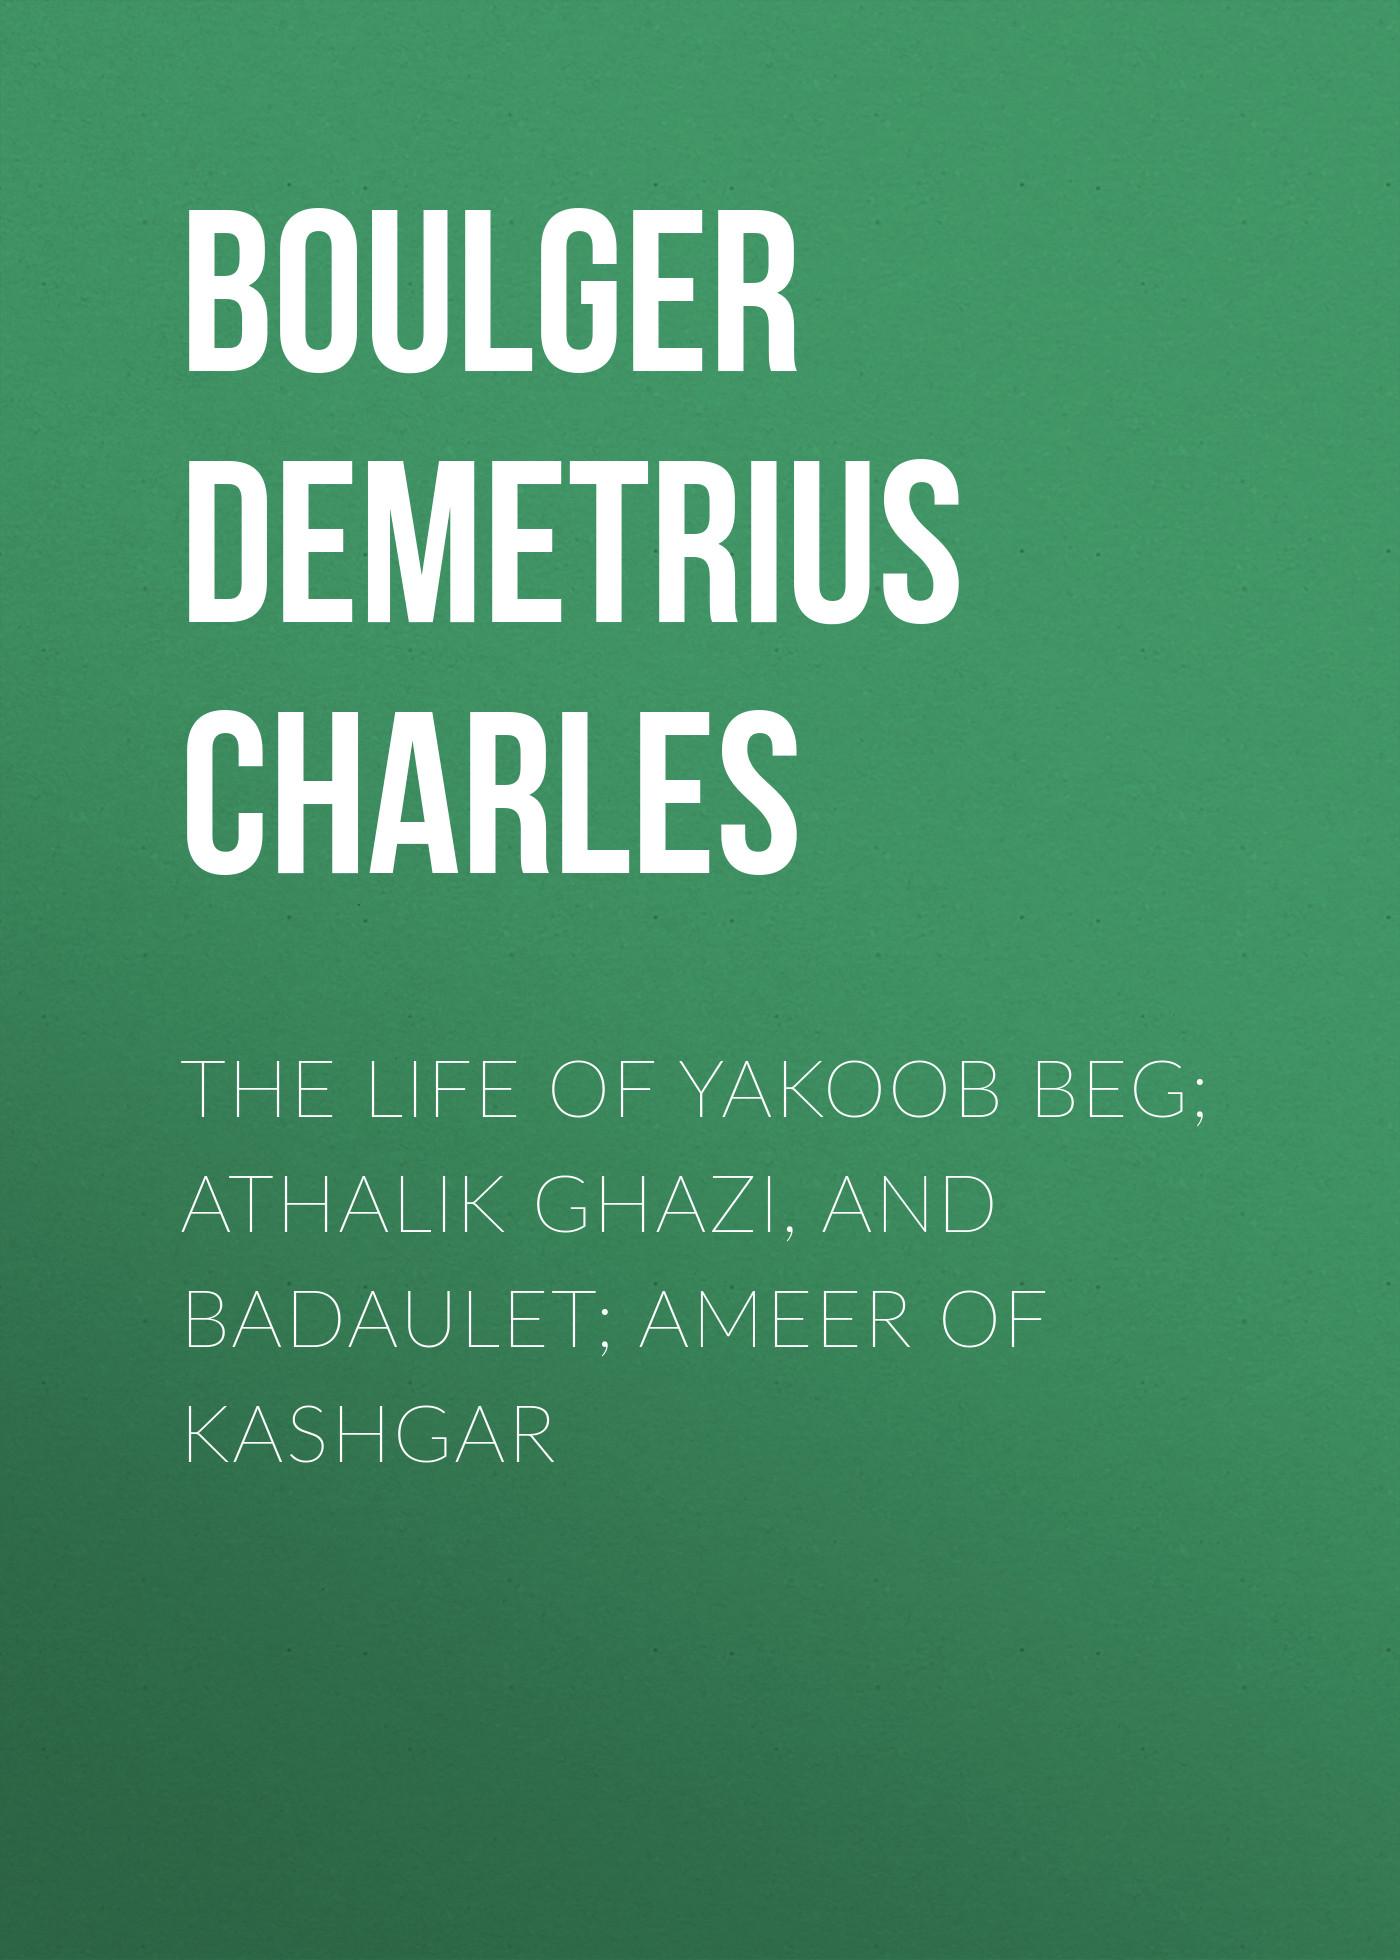 Boulger Demetrius Charles The Life of Yakoob Beg; Athalik Ghazi, and Badaulet; Ameer of Kashgar muhammad al ghazi on translating the quran